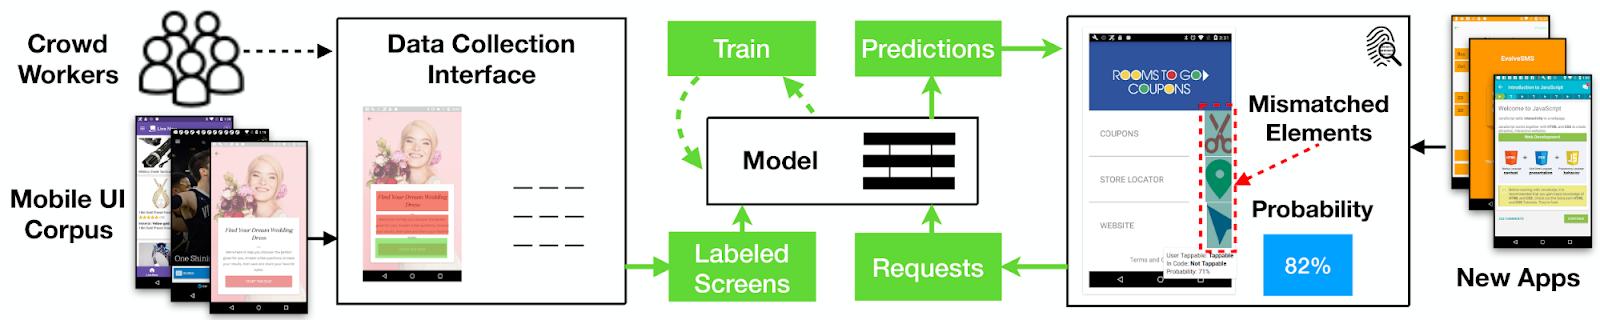 Google AI Blog: Using Deep Learning to Improve Usability on